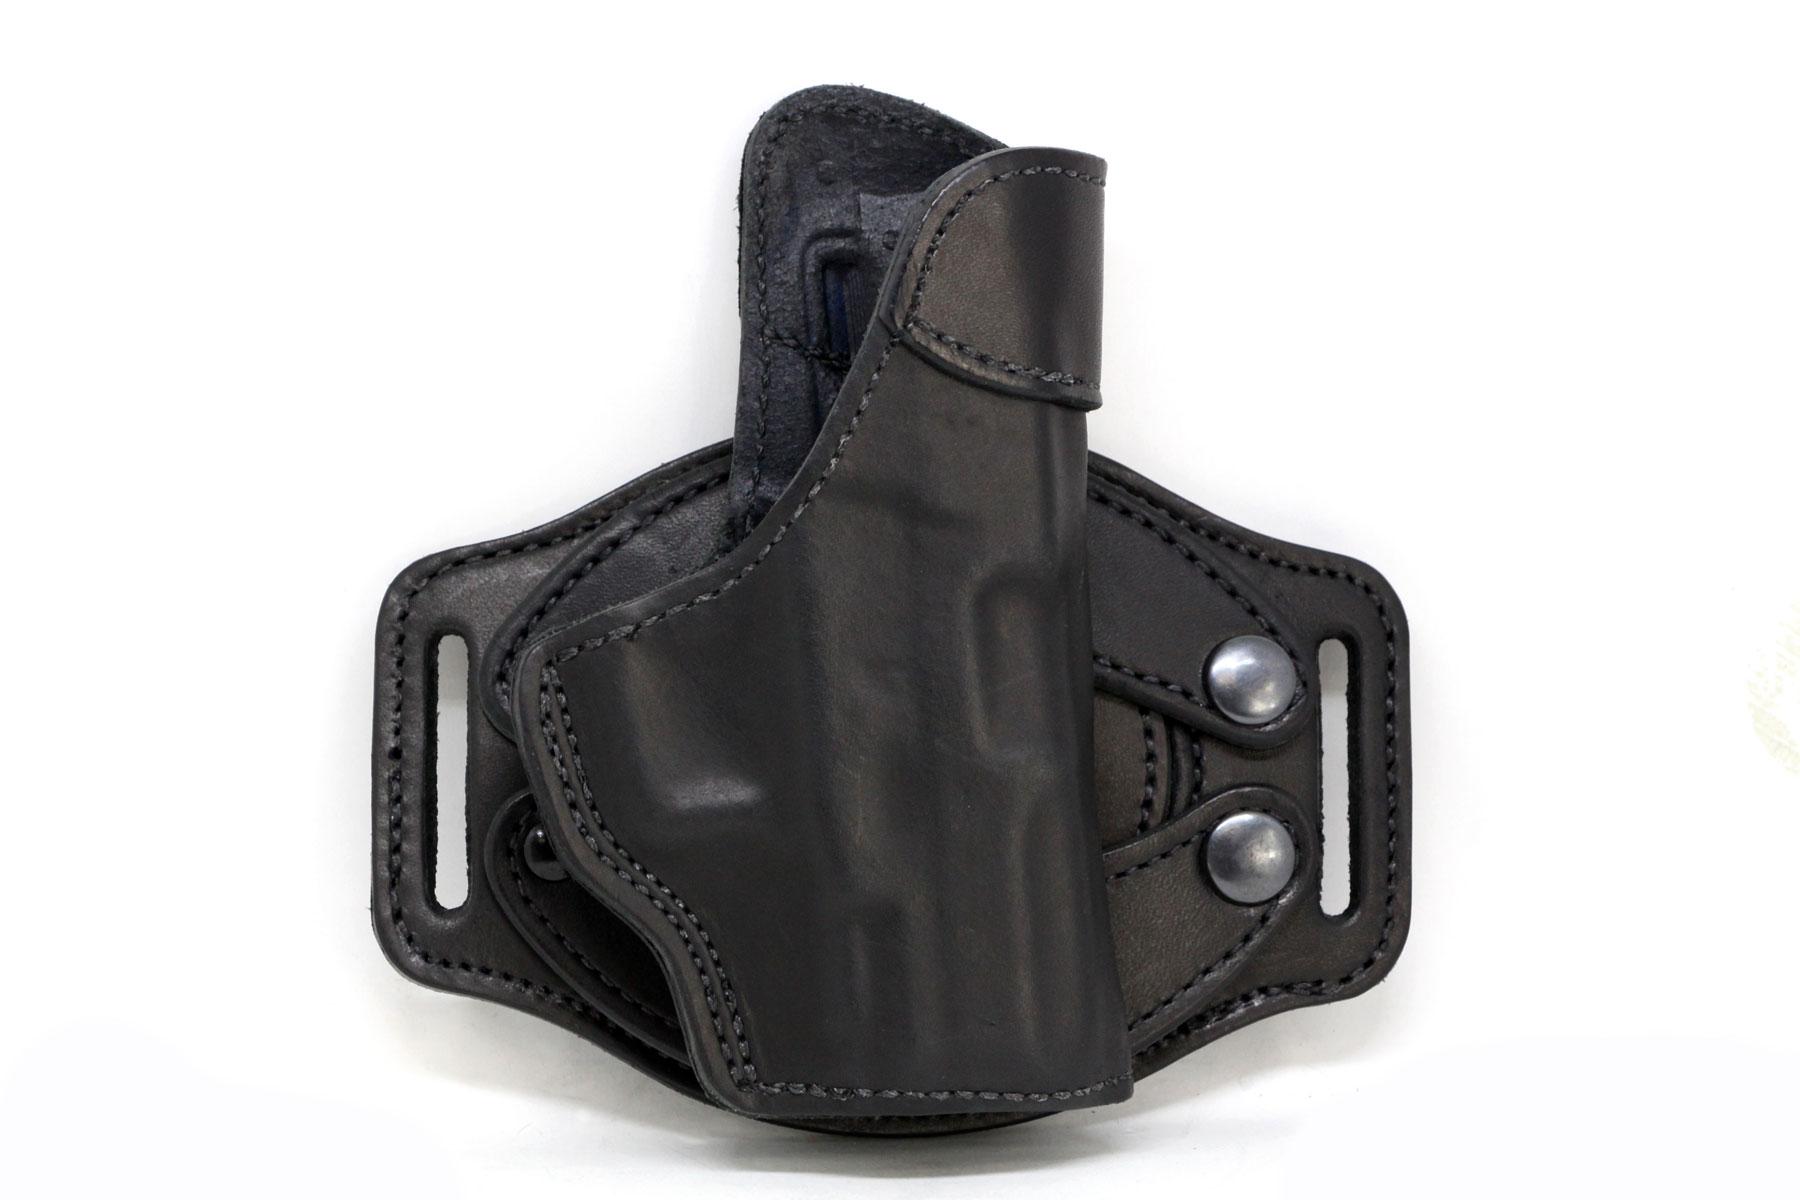 Coonan  357 Magnum 5in  OWB Holster, Modular REVO